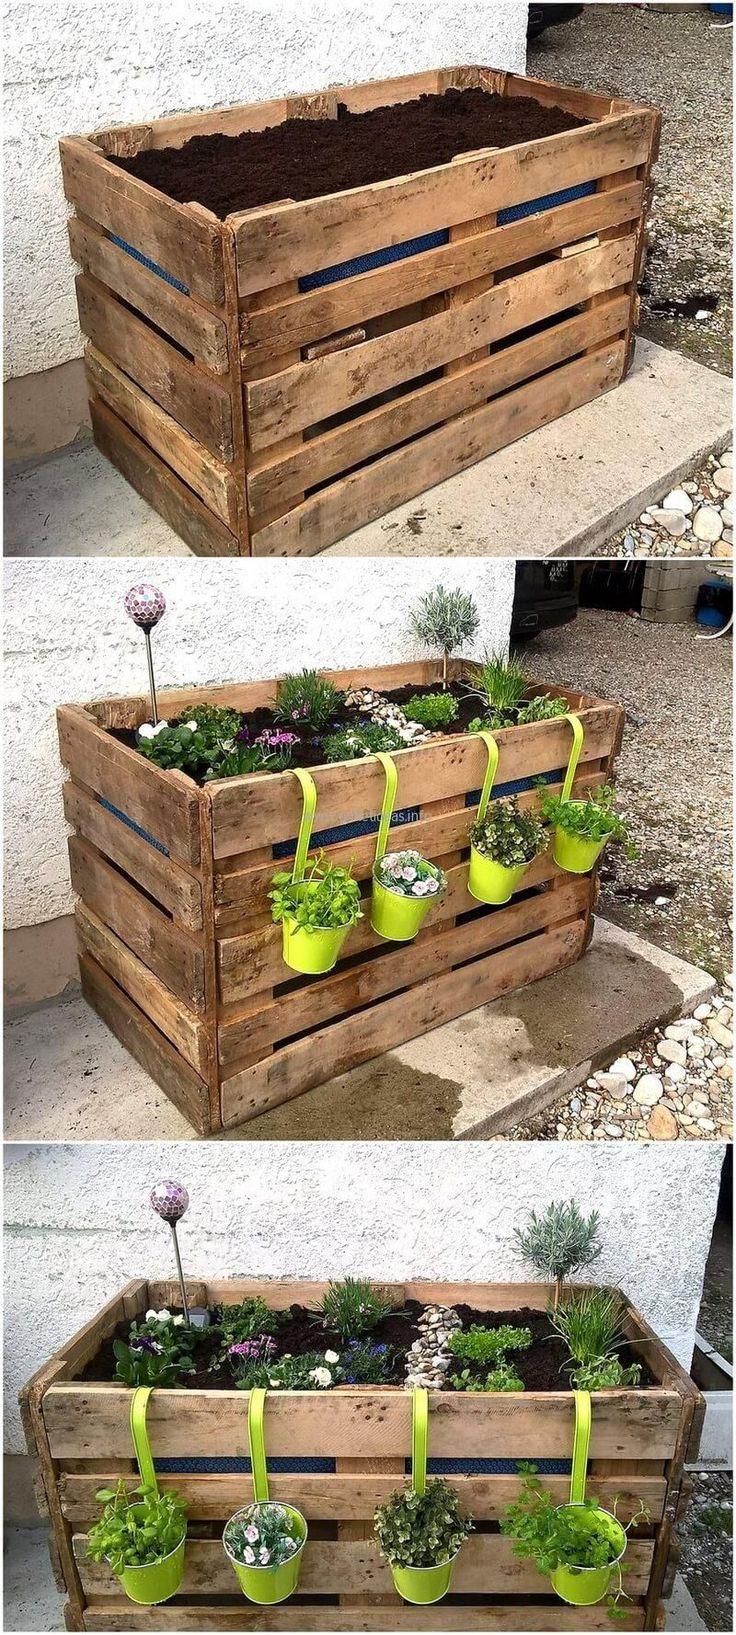 Nice Pallet Planter Part - 4: Wooden Pallet Planter Plan 1